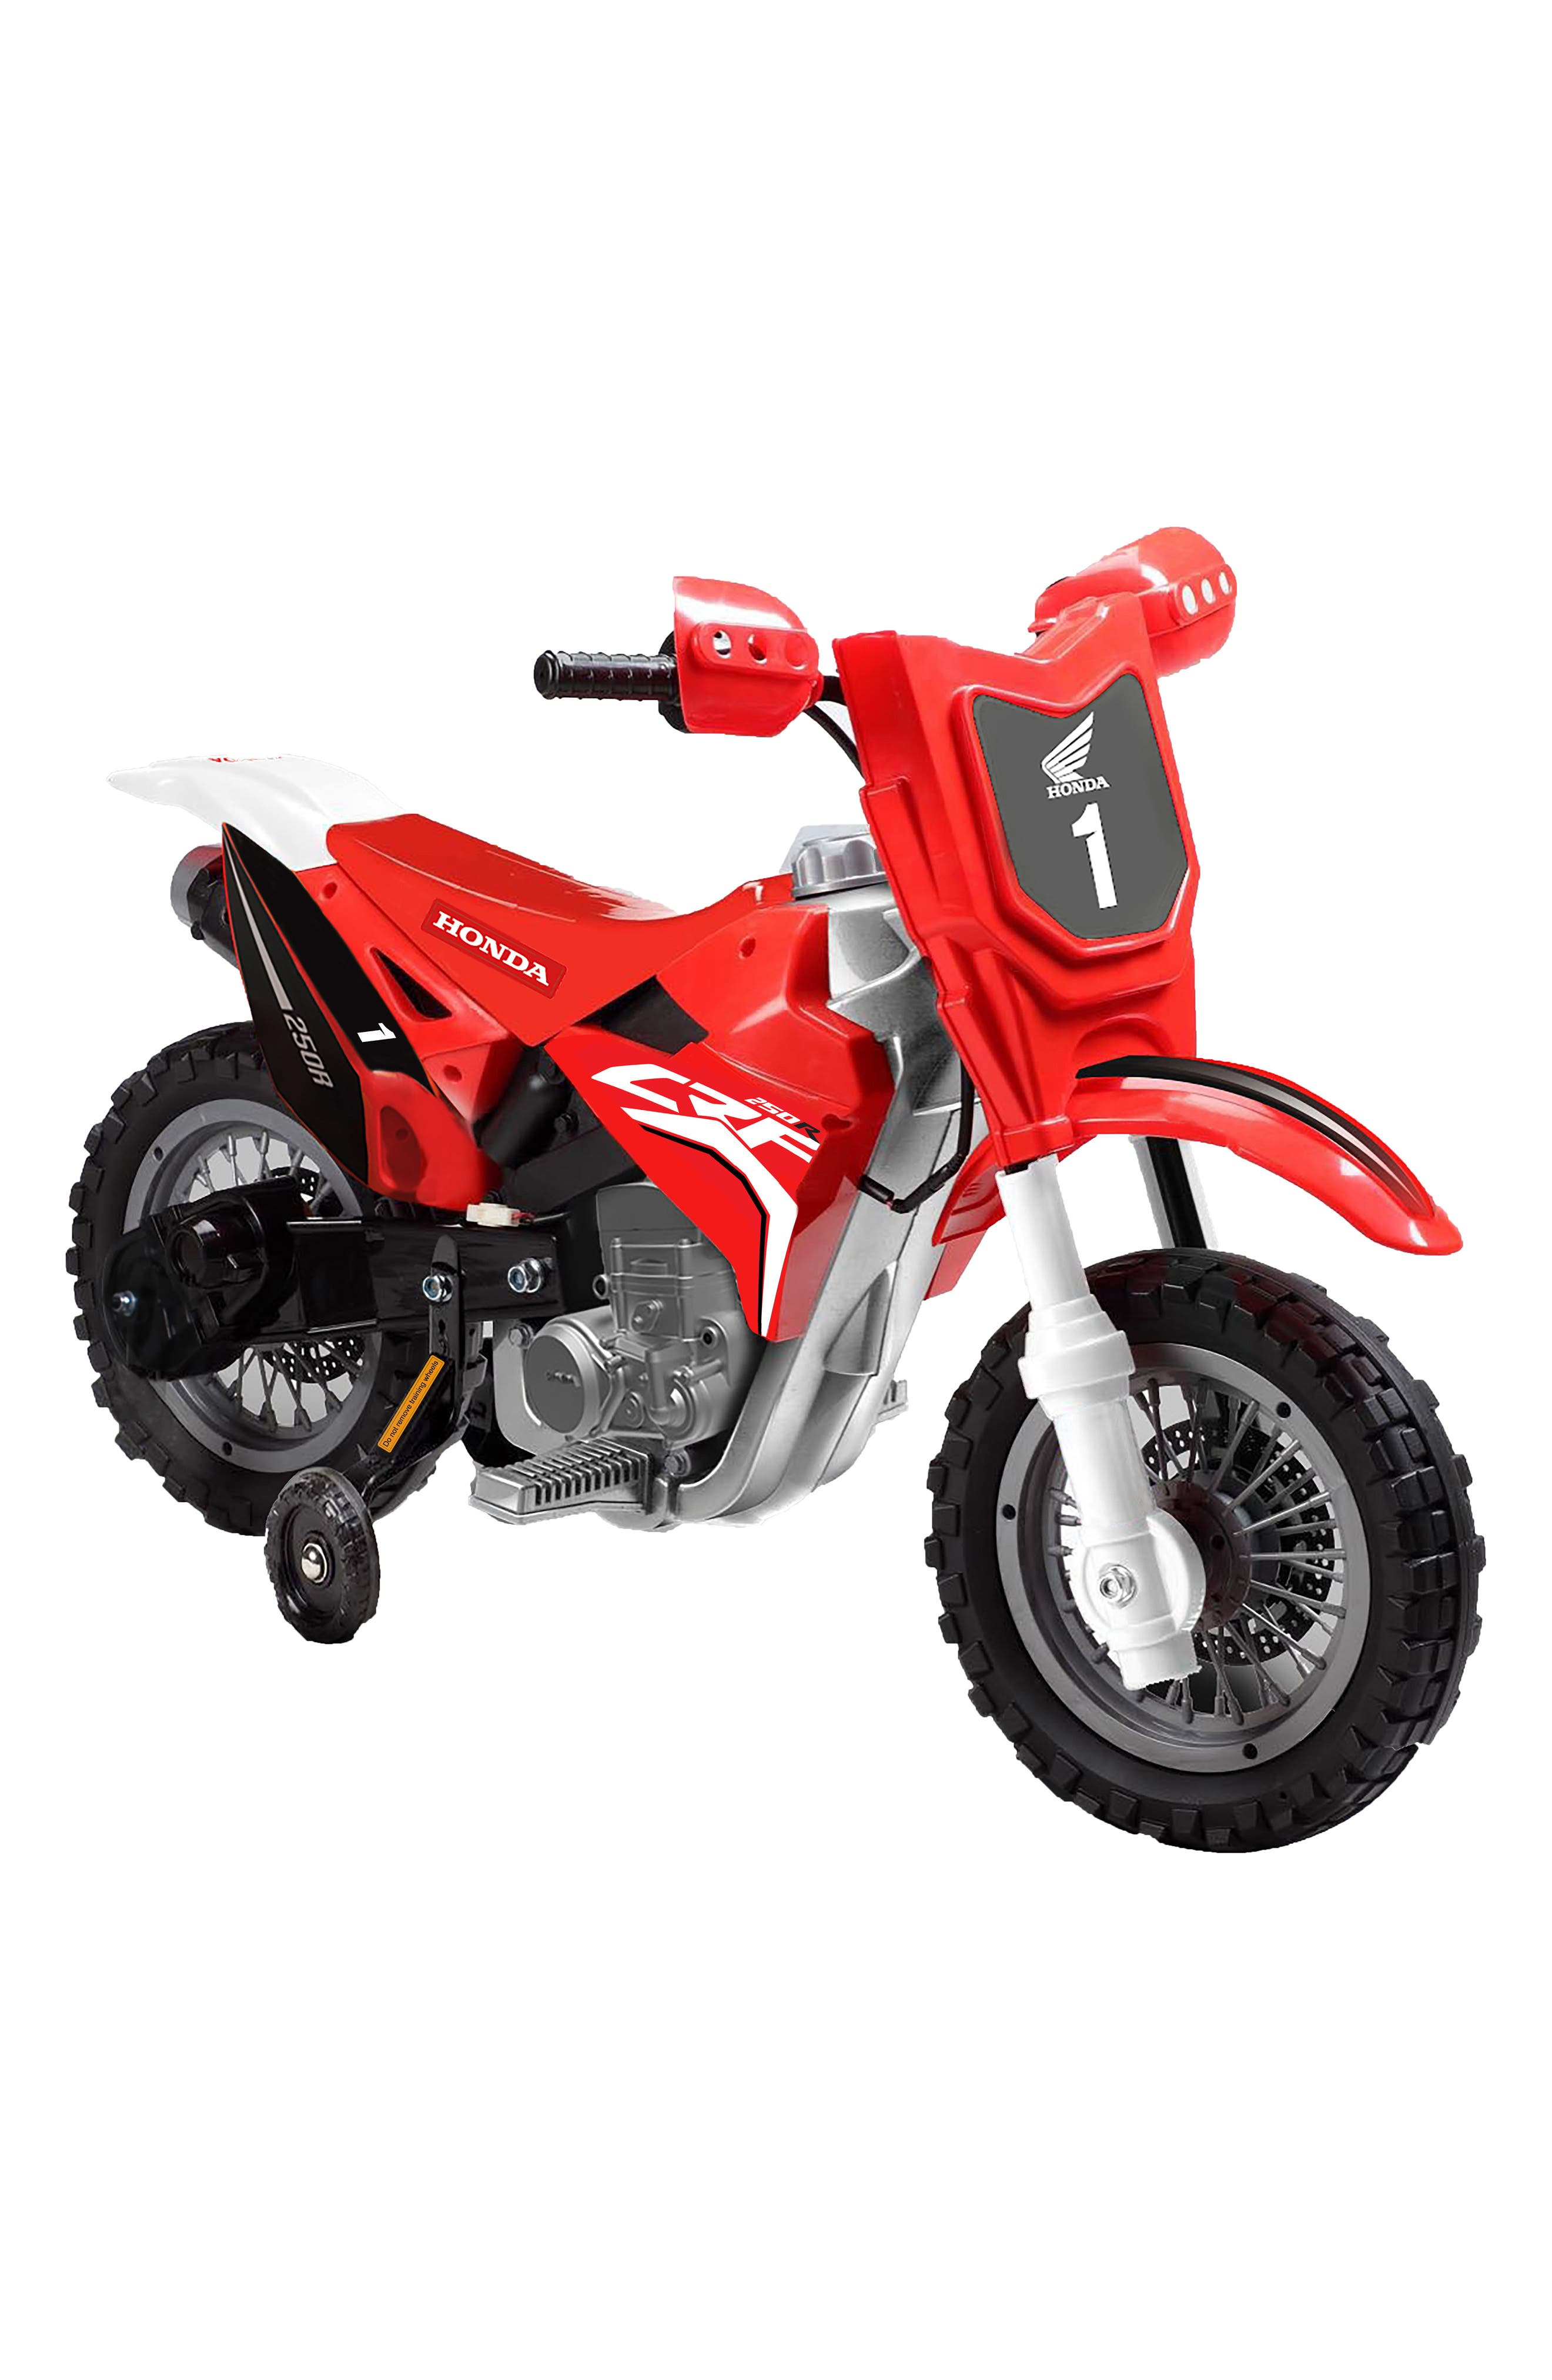 Toddler Boys Best Ride On Cars Honda Dirt Bike RideOn Toy Motorcycle